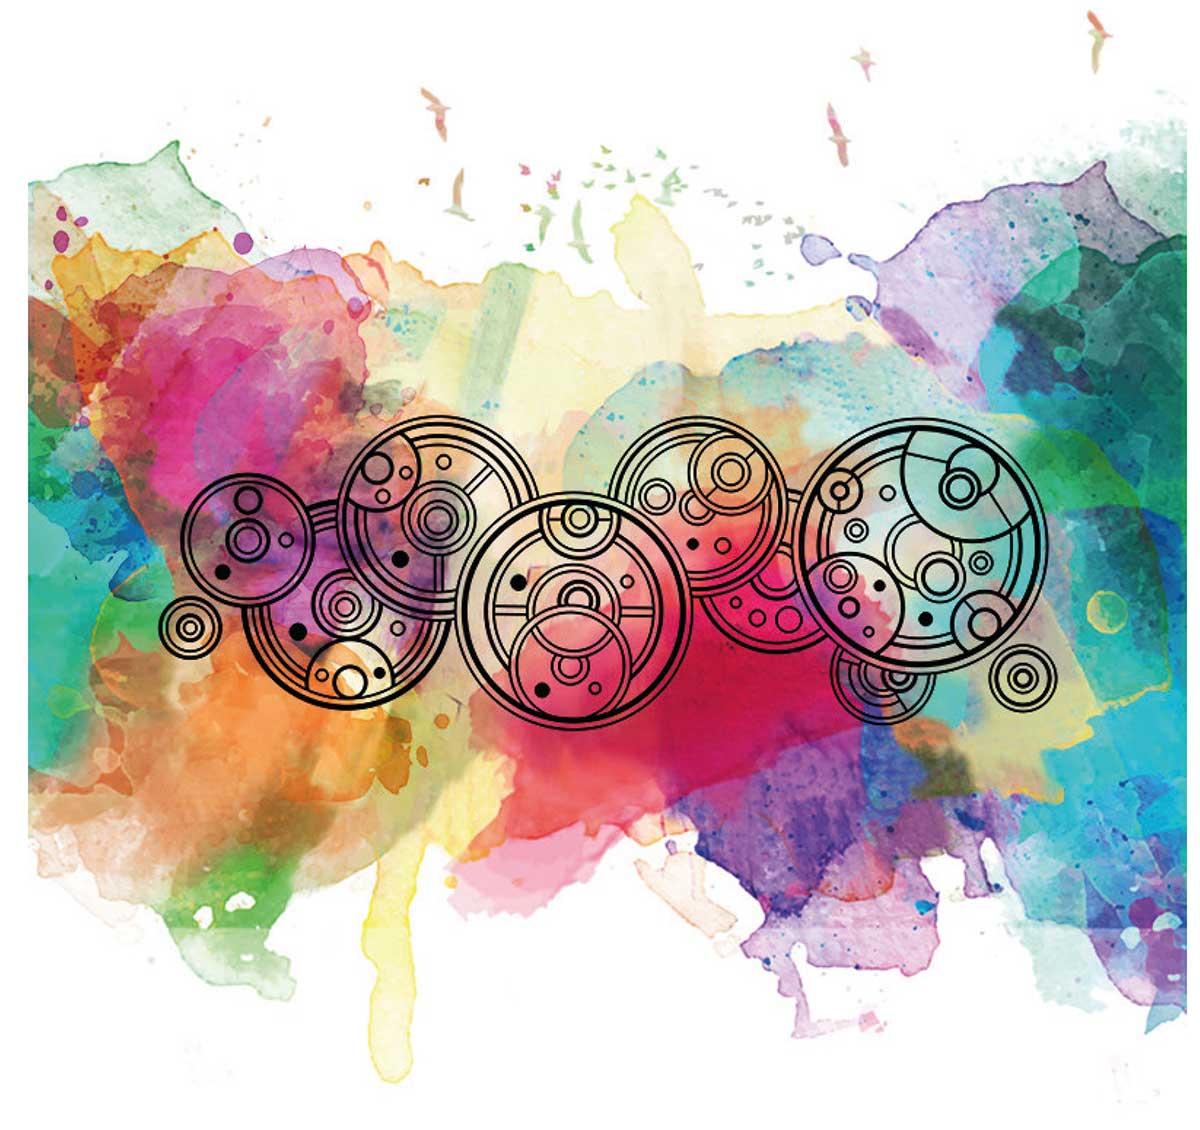 Illustration-Typografie-Aquarell